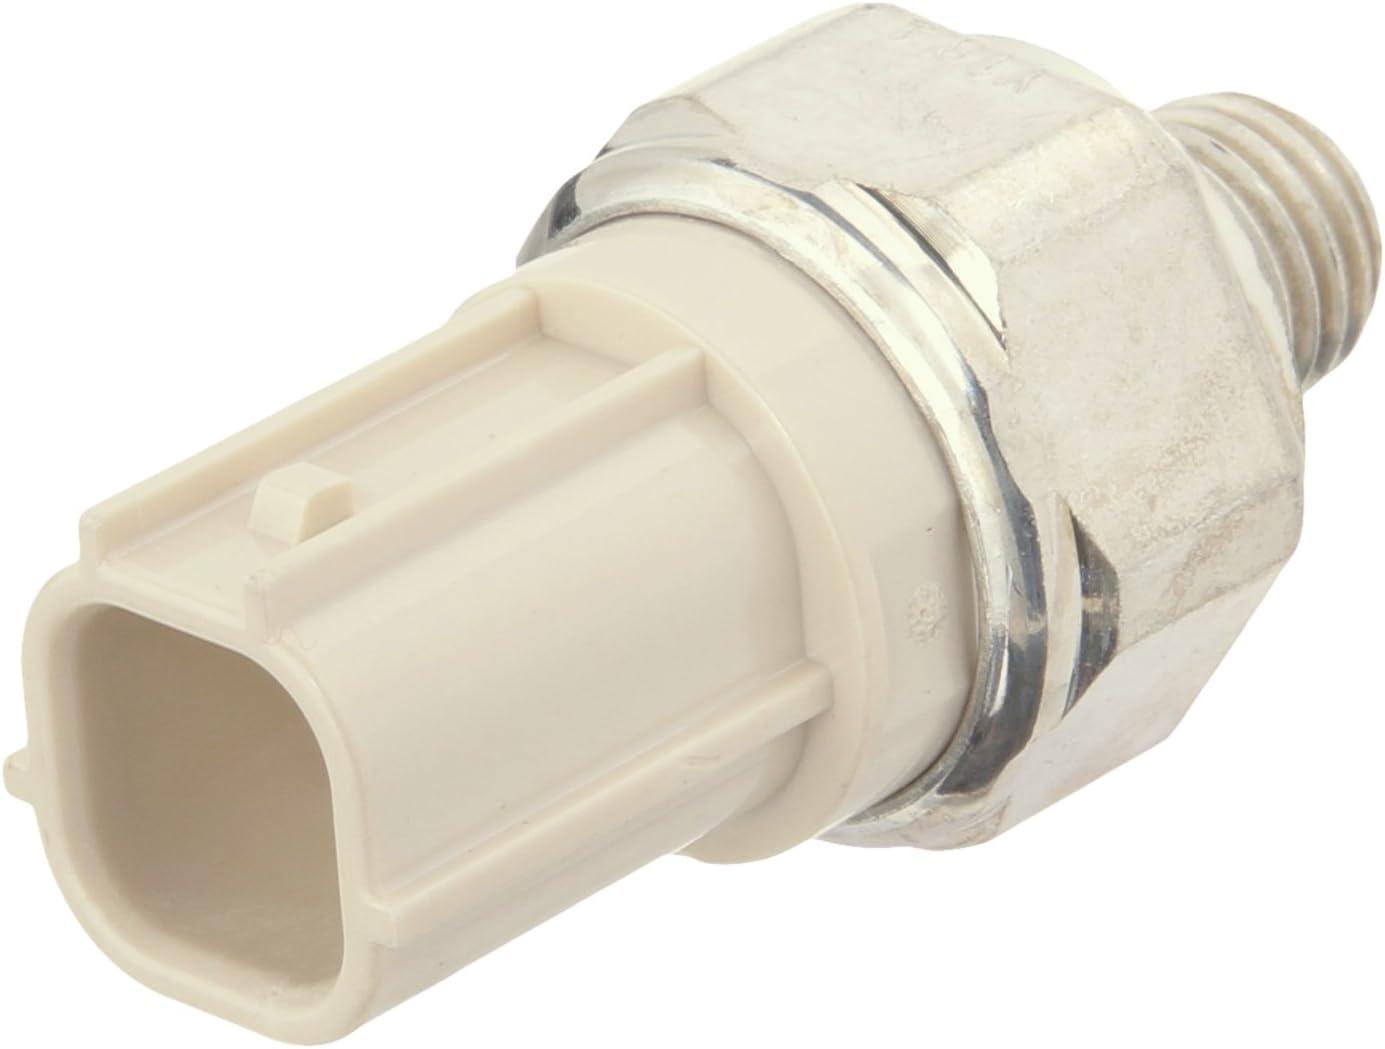 Honda Genuine 28600-RKE-004 Automatic Transmission Oil Pressure Switch Assembly